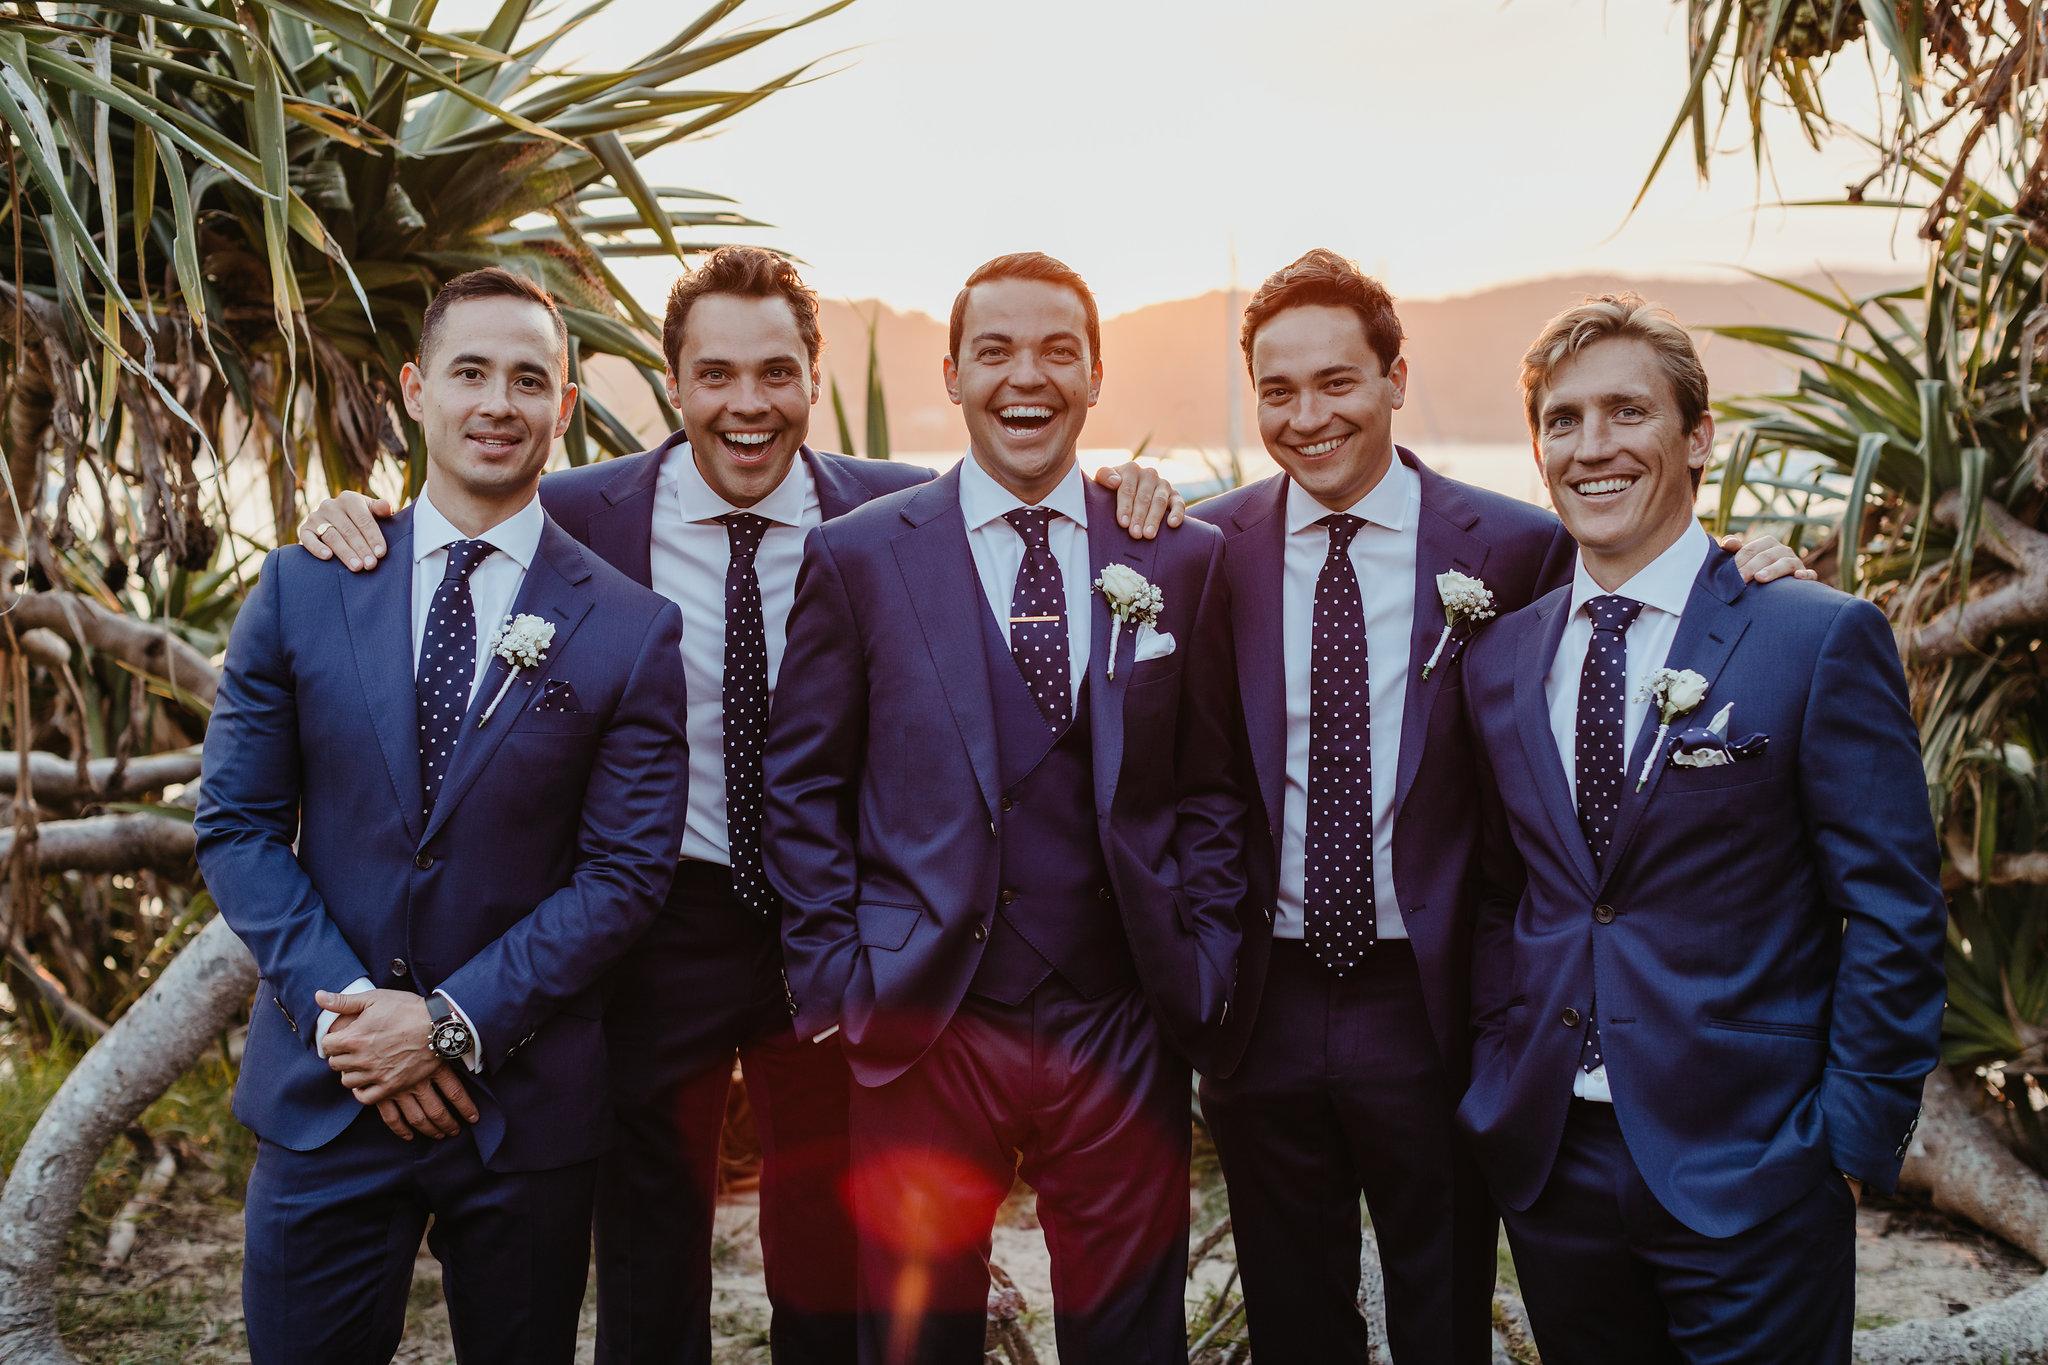 gen_chris_story_of_us_wedding-0620.JPG